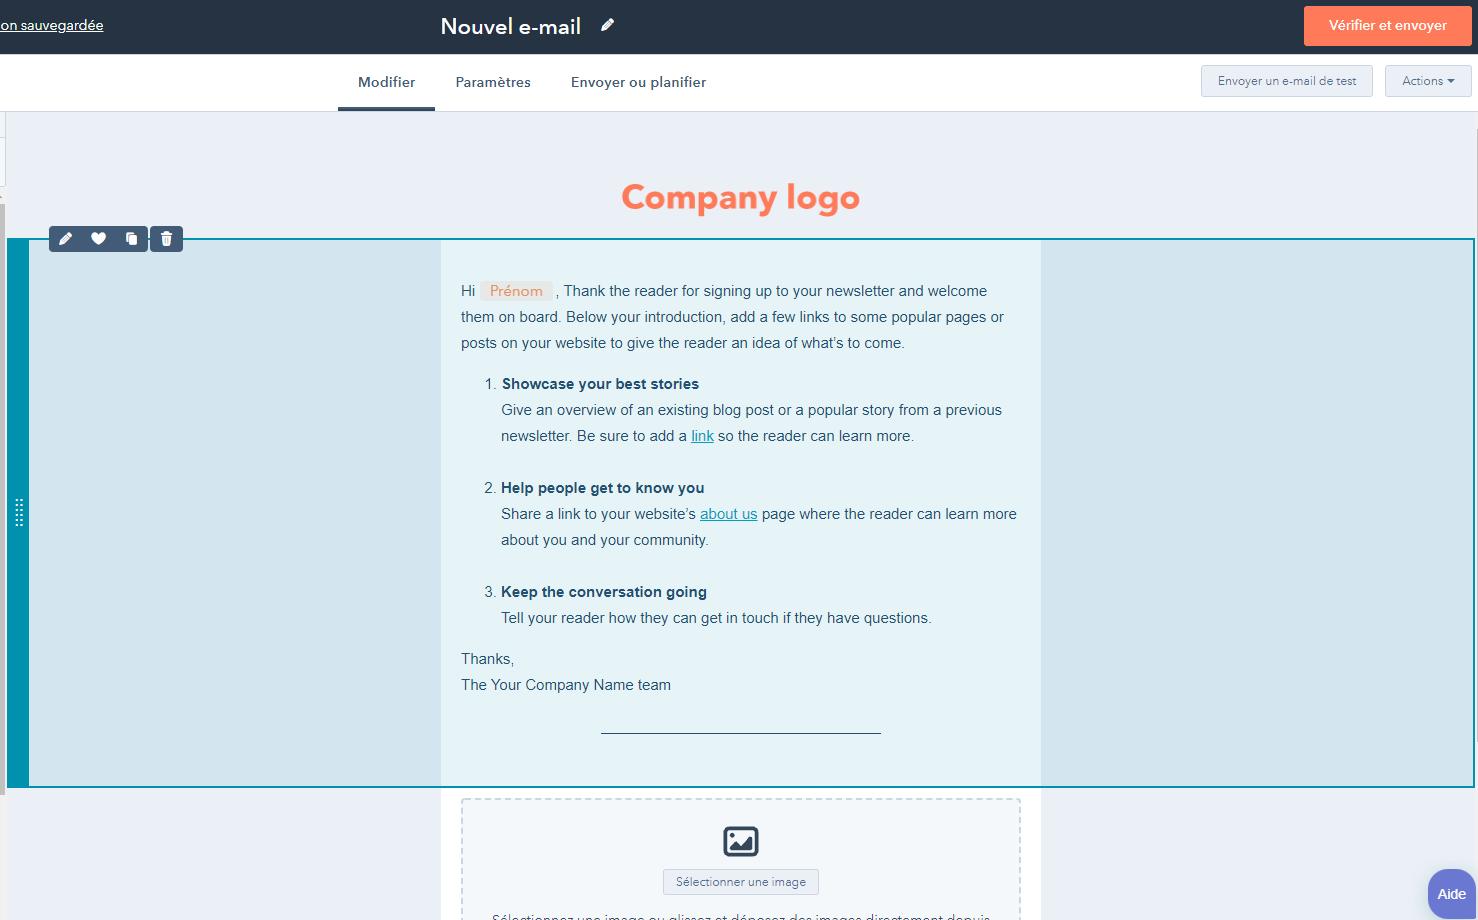 création d'une newsletter drag and drop dans HubSpot